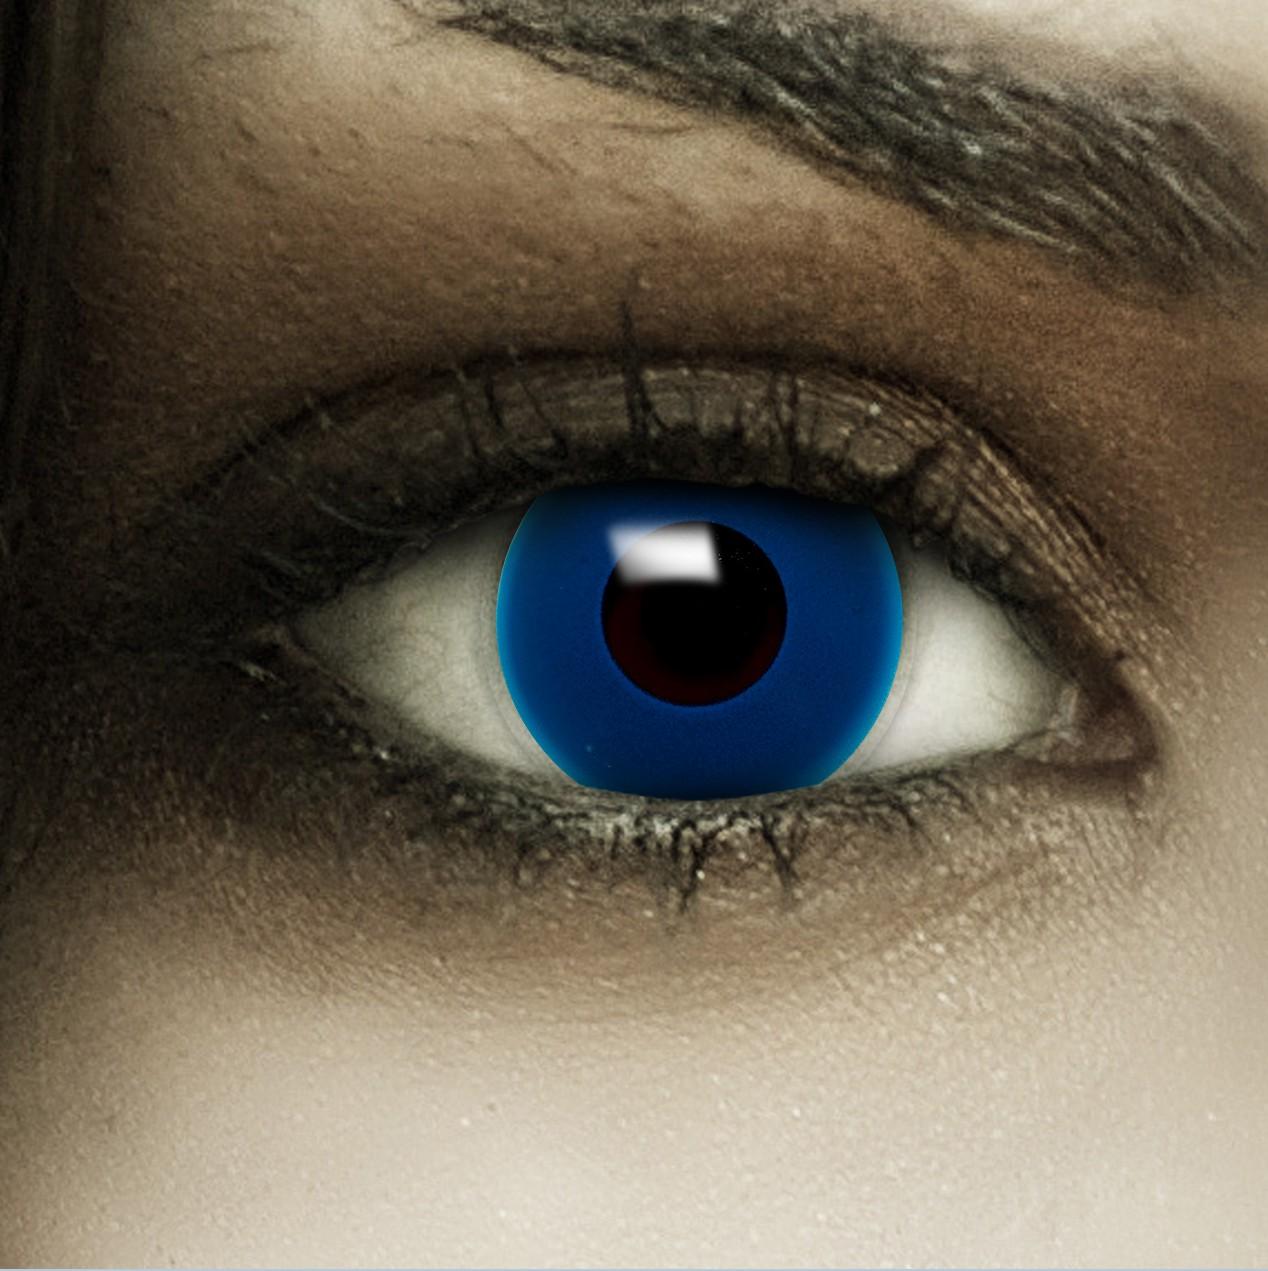 farbige halloween kontaktlinsen dunkel blau blaue ohne. Black Bedroom Furniture Sets. Home Design Ideas